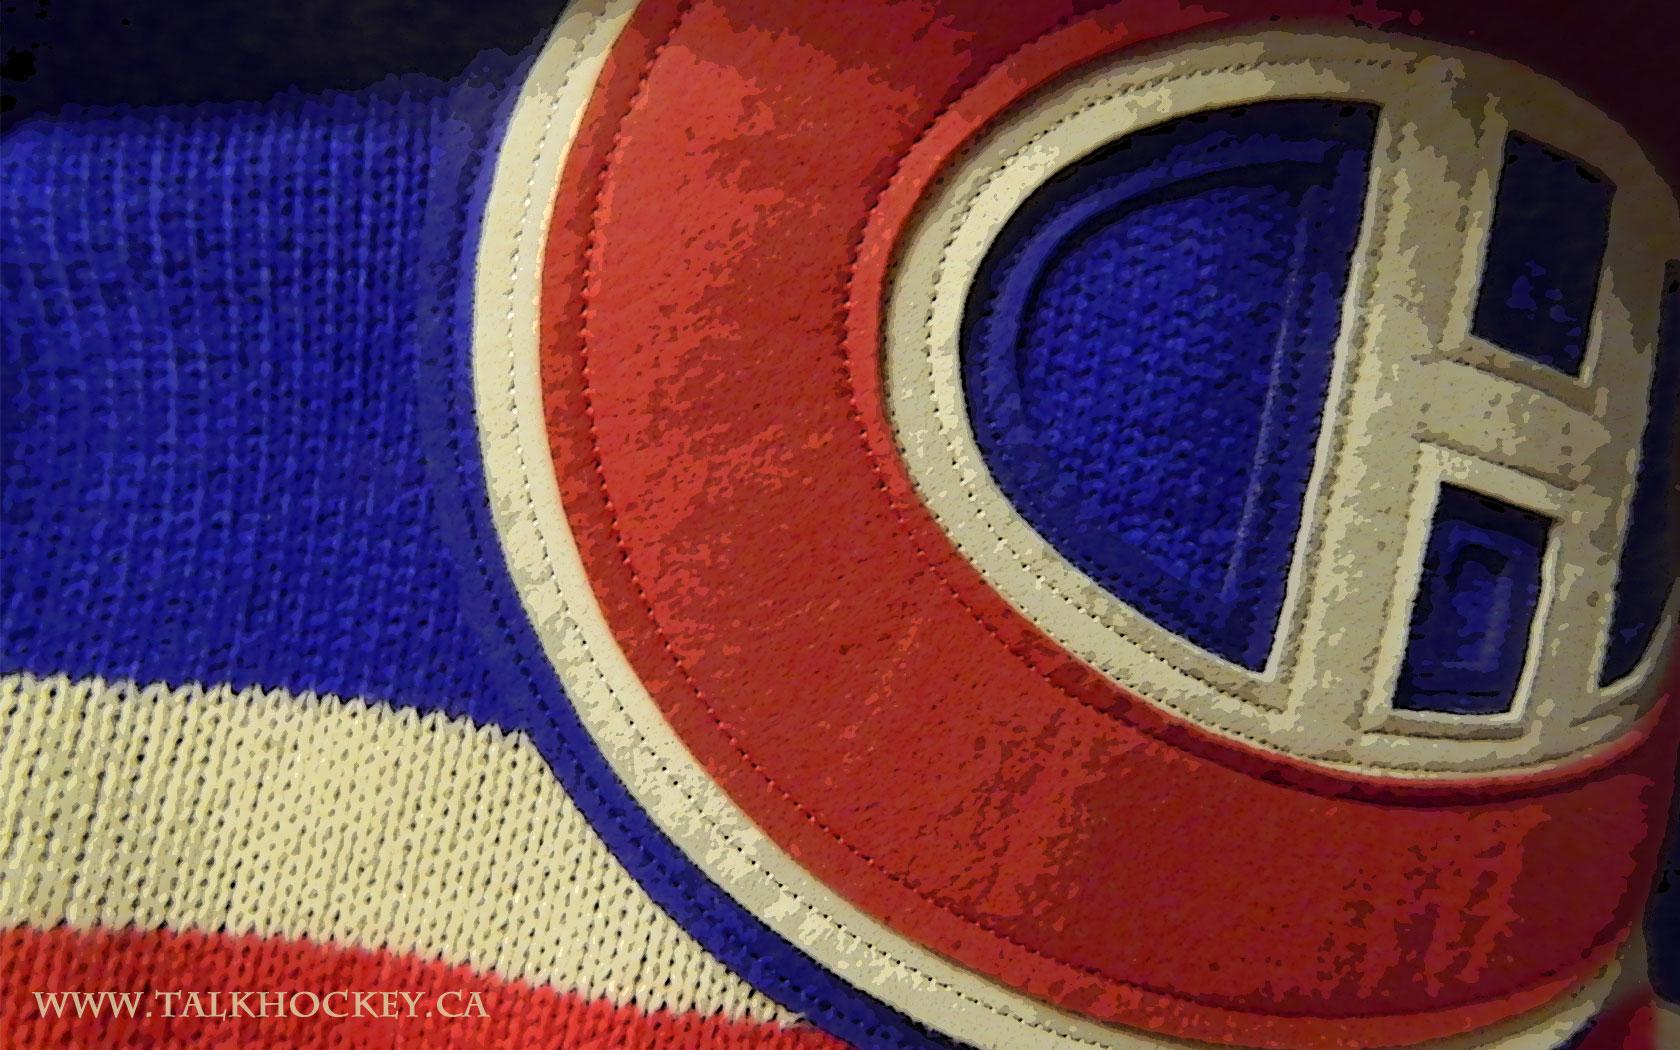 Montreal Canadiens Wallpaper 1680x1050